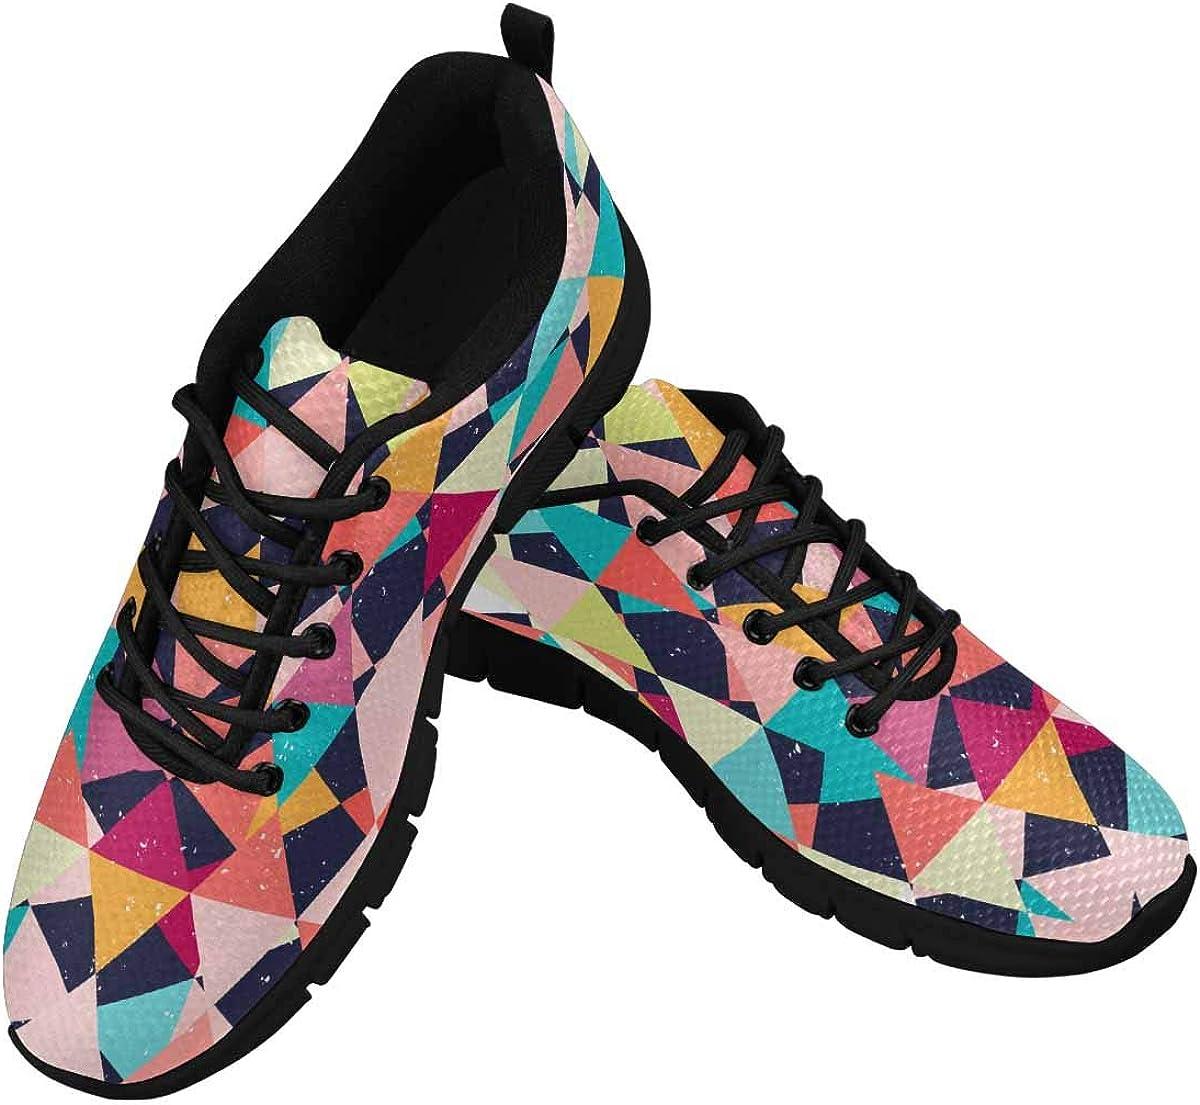 InterestPrint Mosaic Pattern Women's Athletic Walking Shoes Comfort Mesh Non Slip